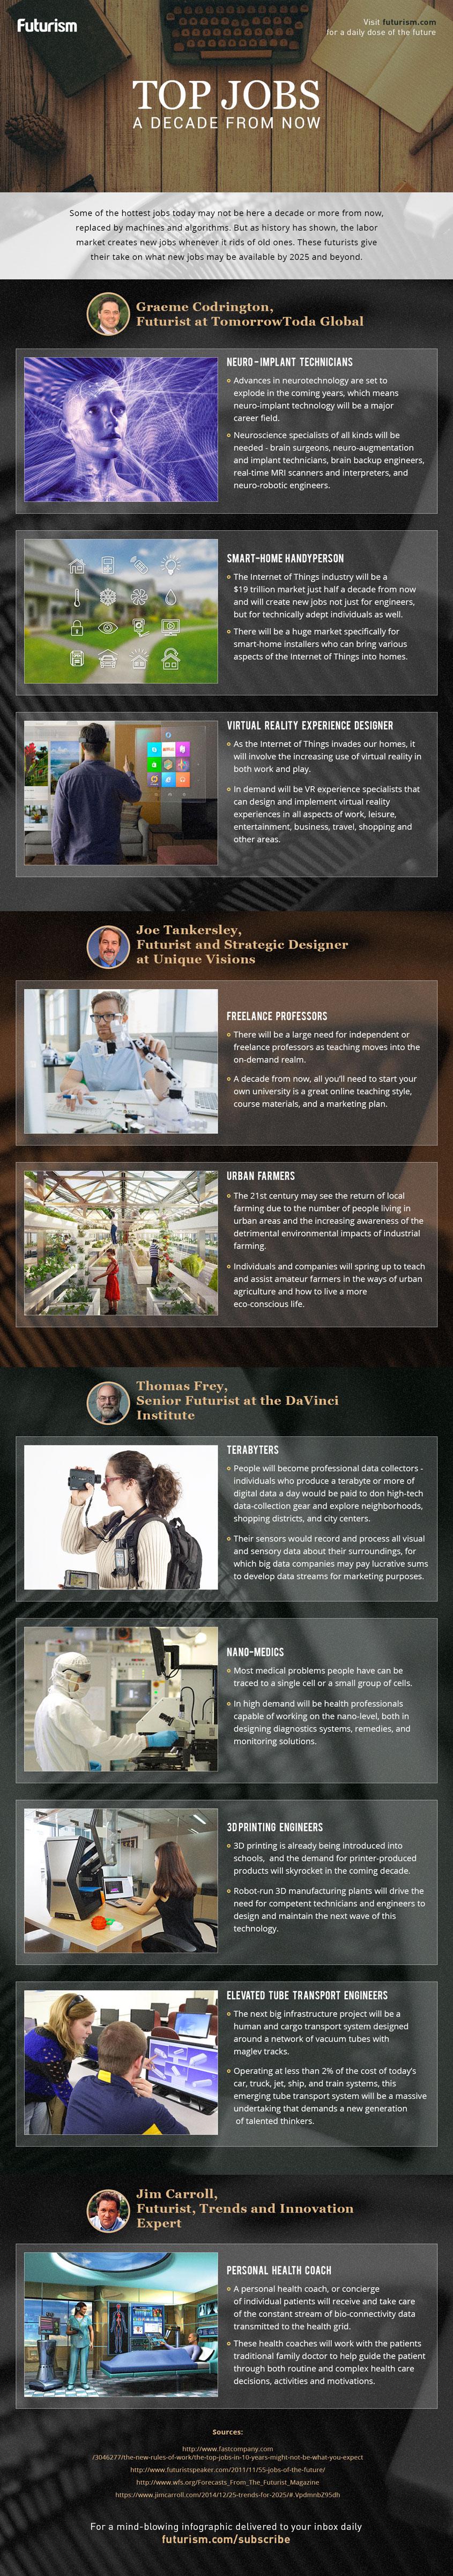 top-jobs-infographic